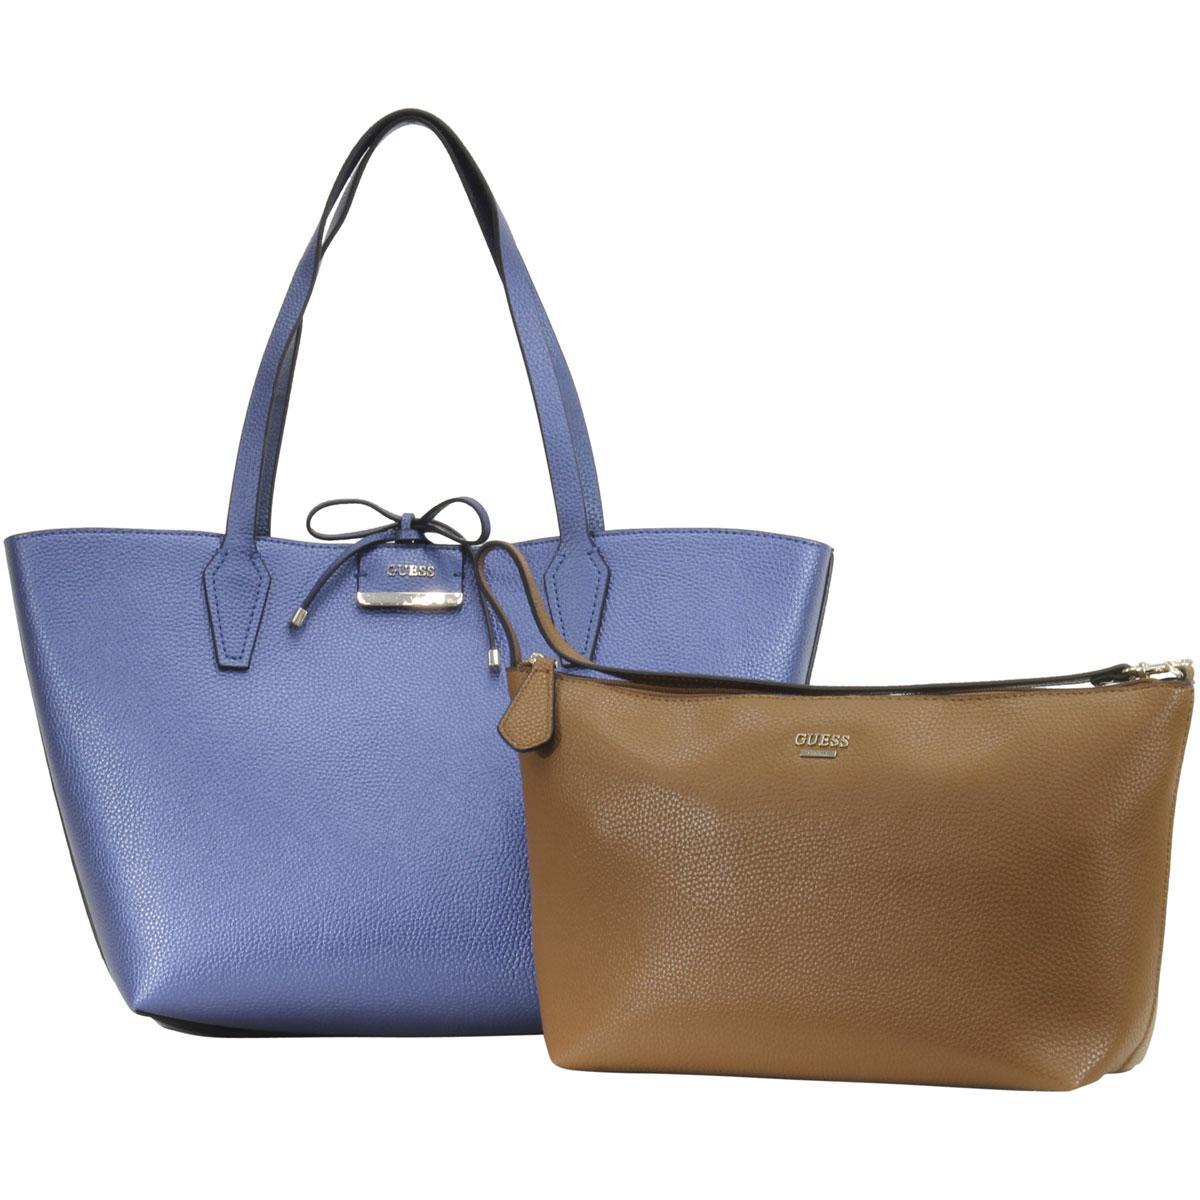 Guess Women's Bobbi Inside-Out Large Reversible Tote Handbag Set